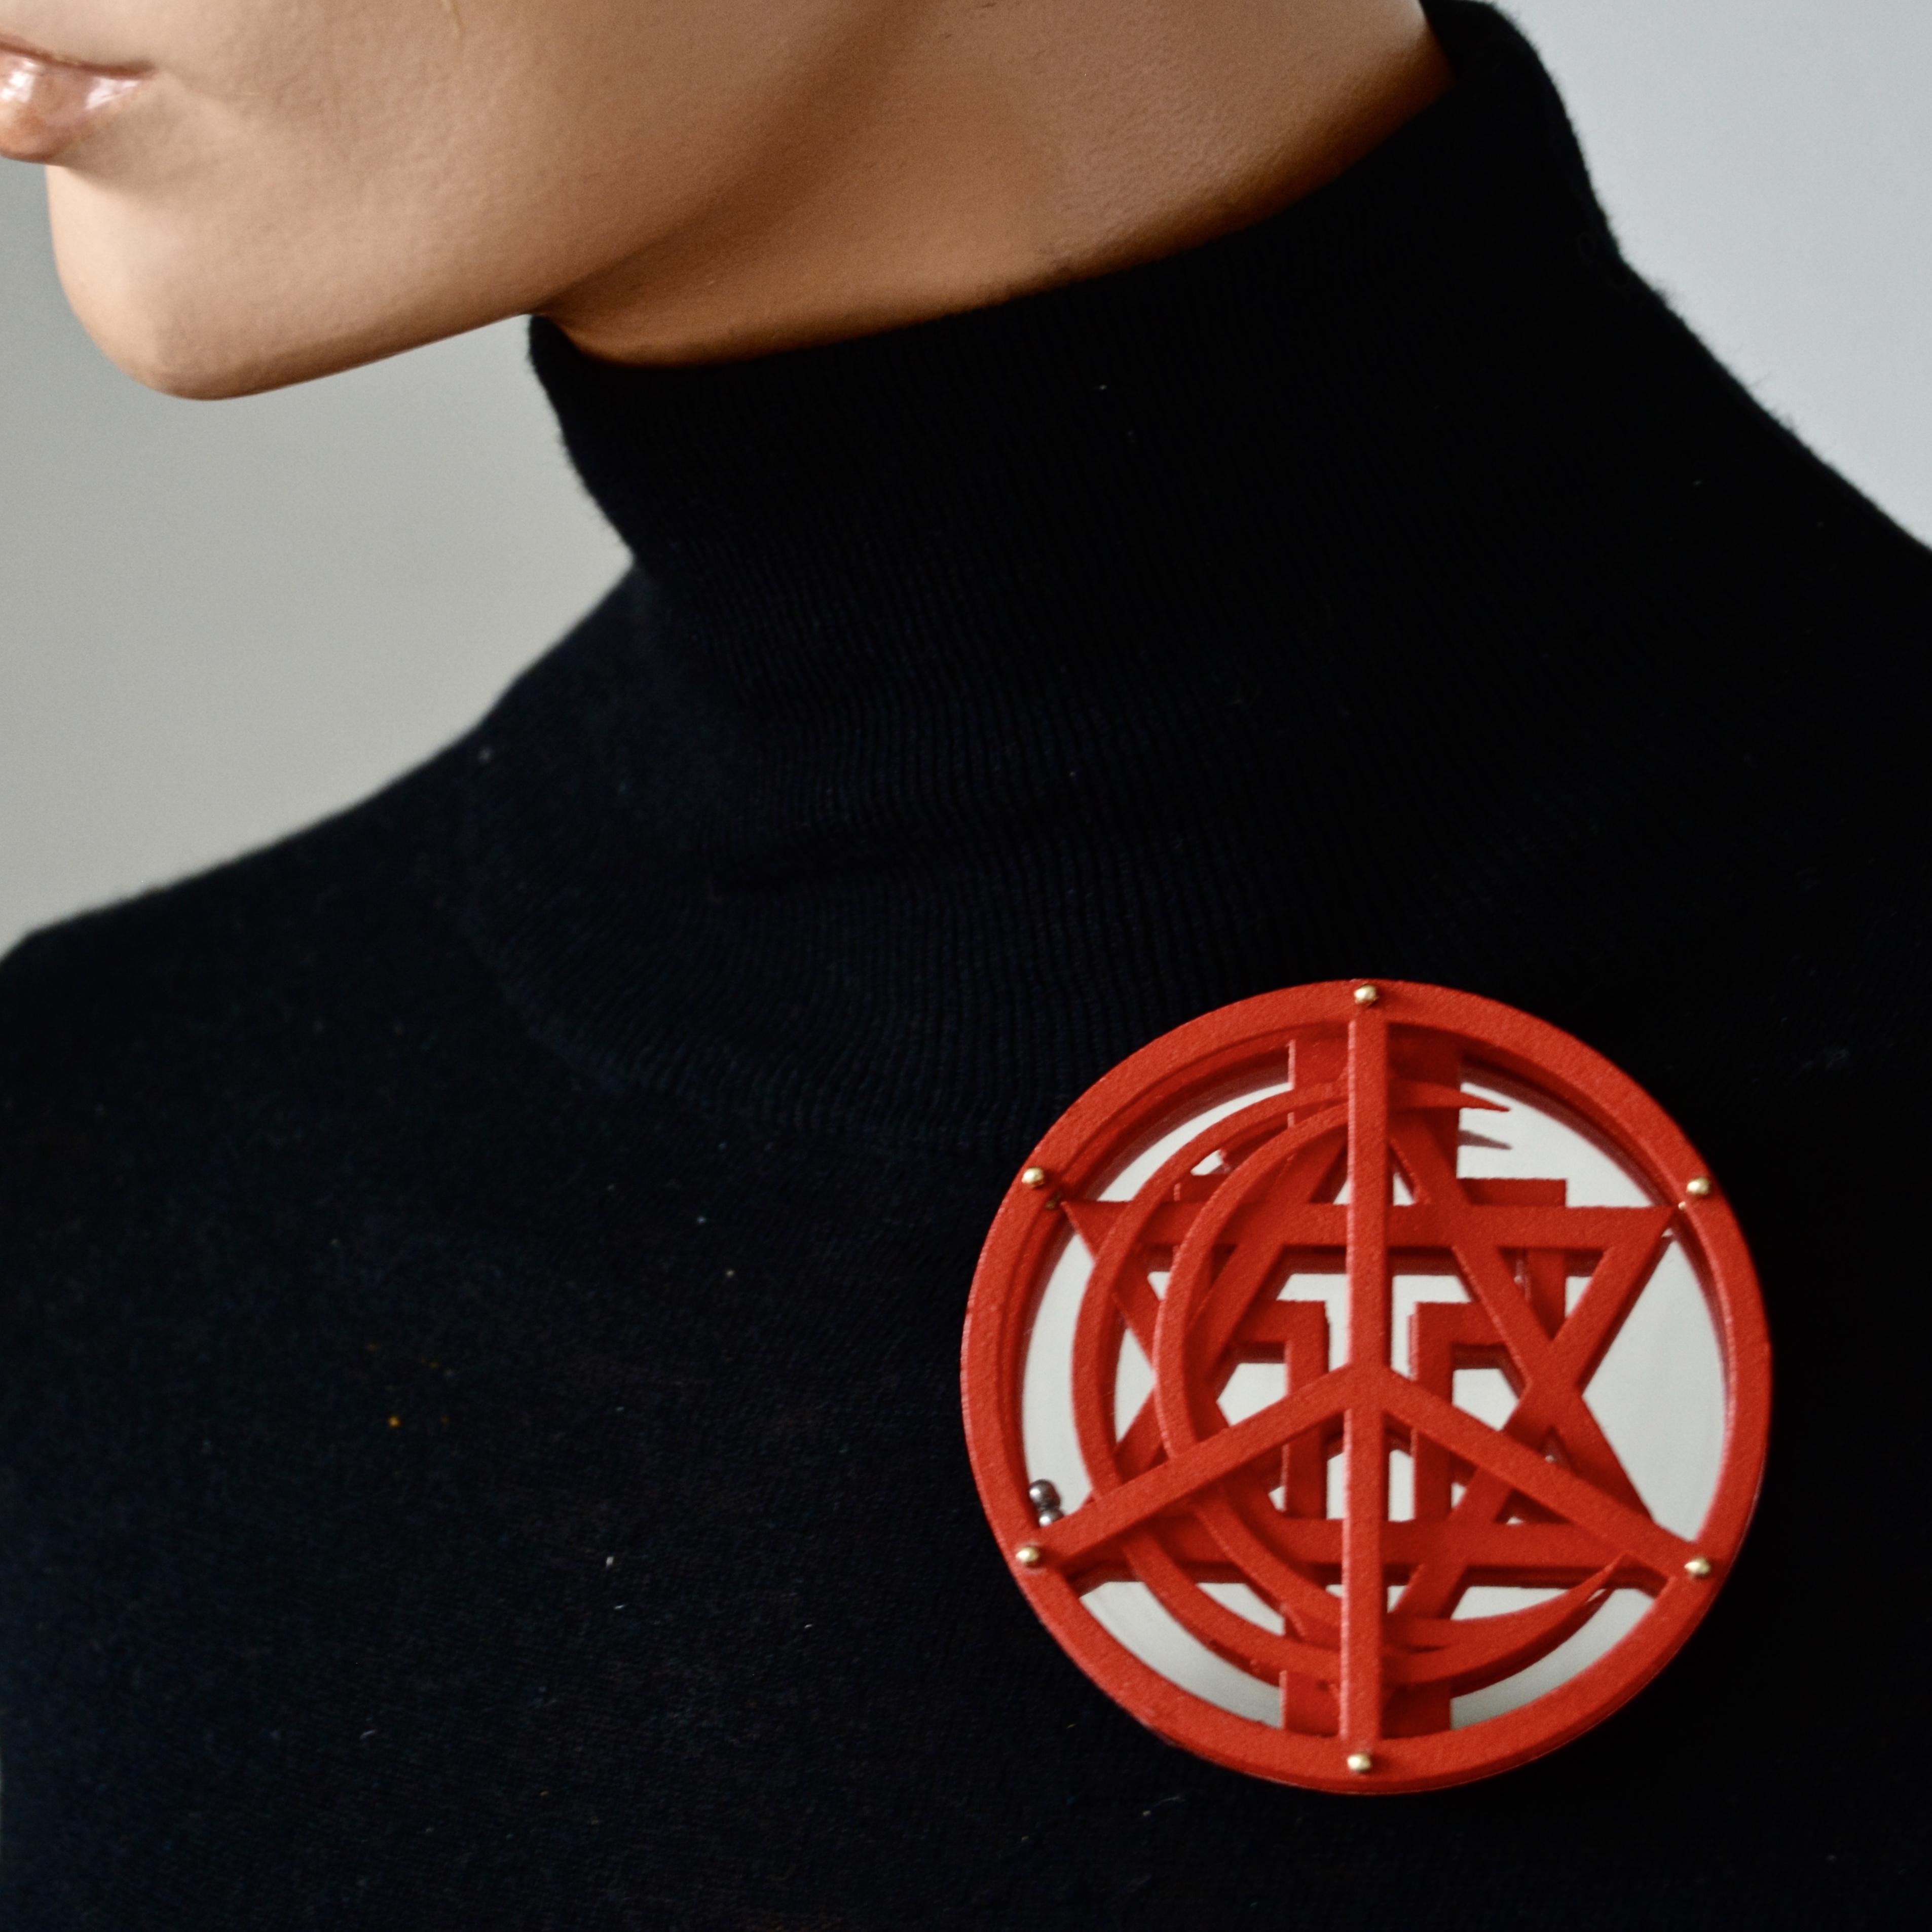 PEACE (brooch/necklace)